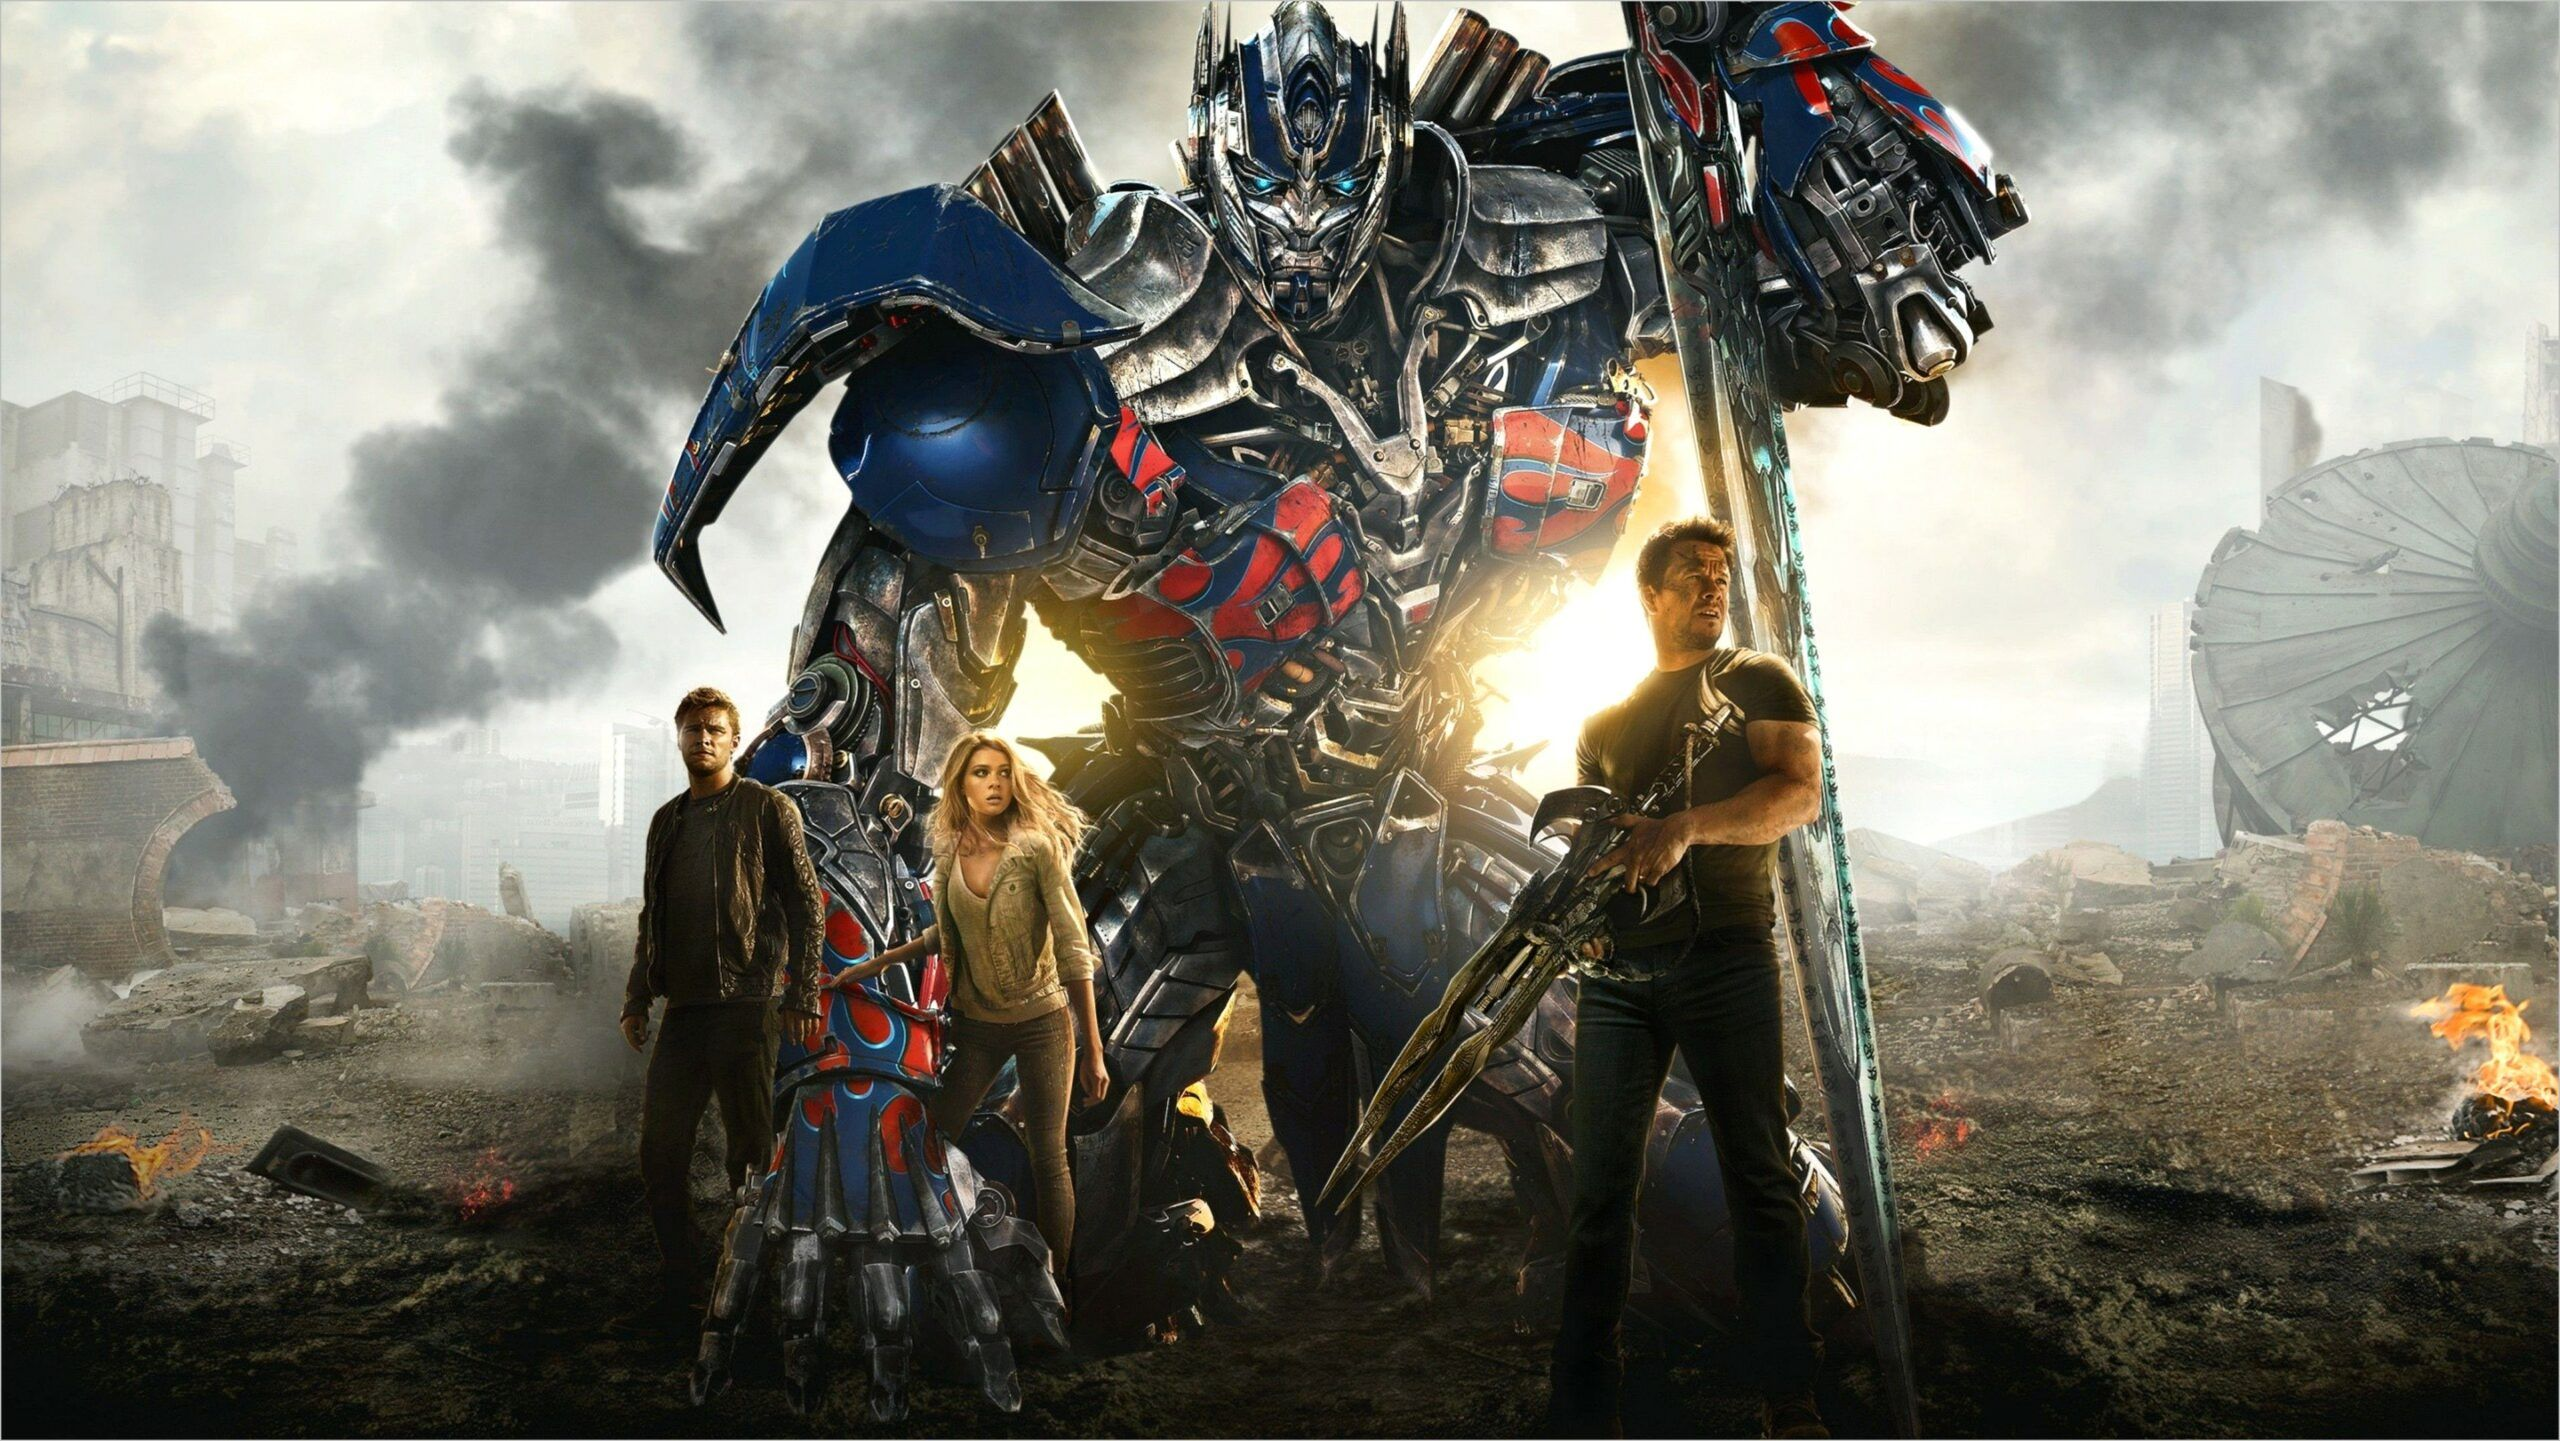 Transformers Wallpaper 4k For Pc Transformers Age Of Extinction Transformers 4 Transformers Age